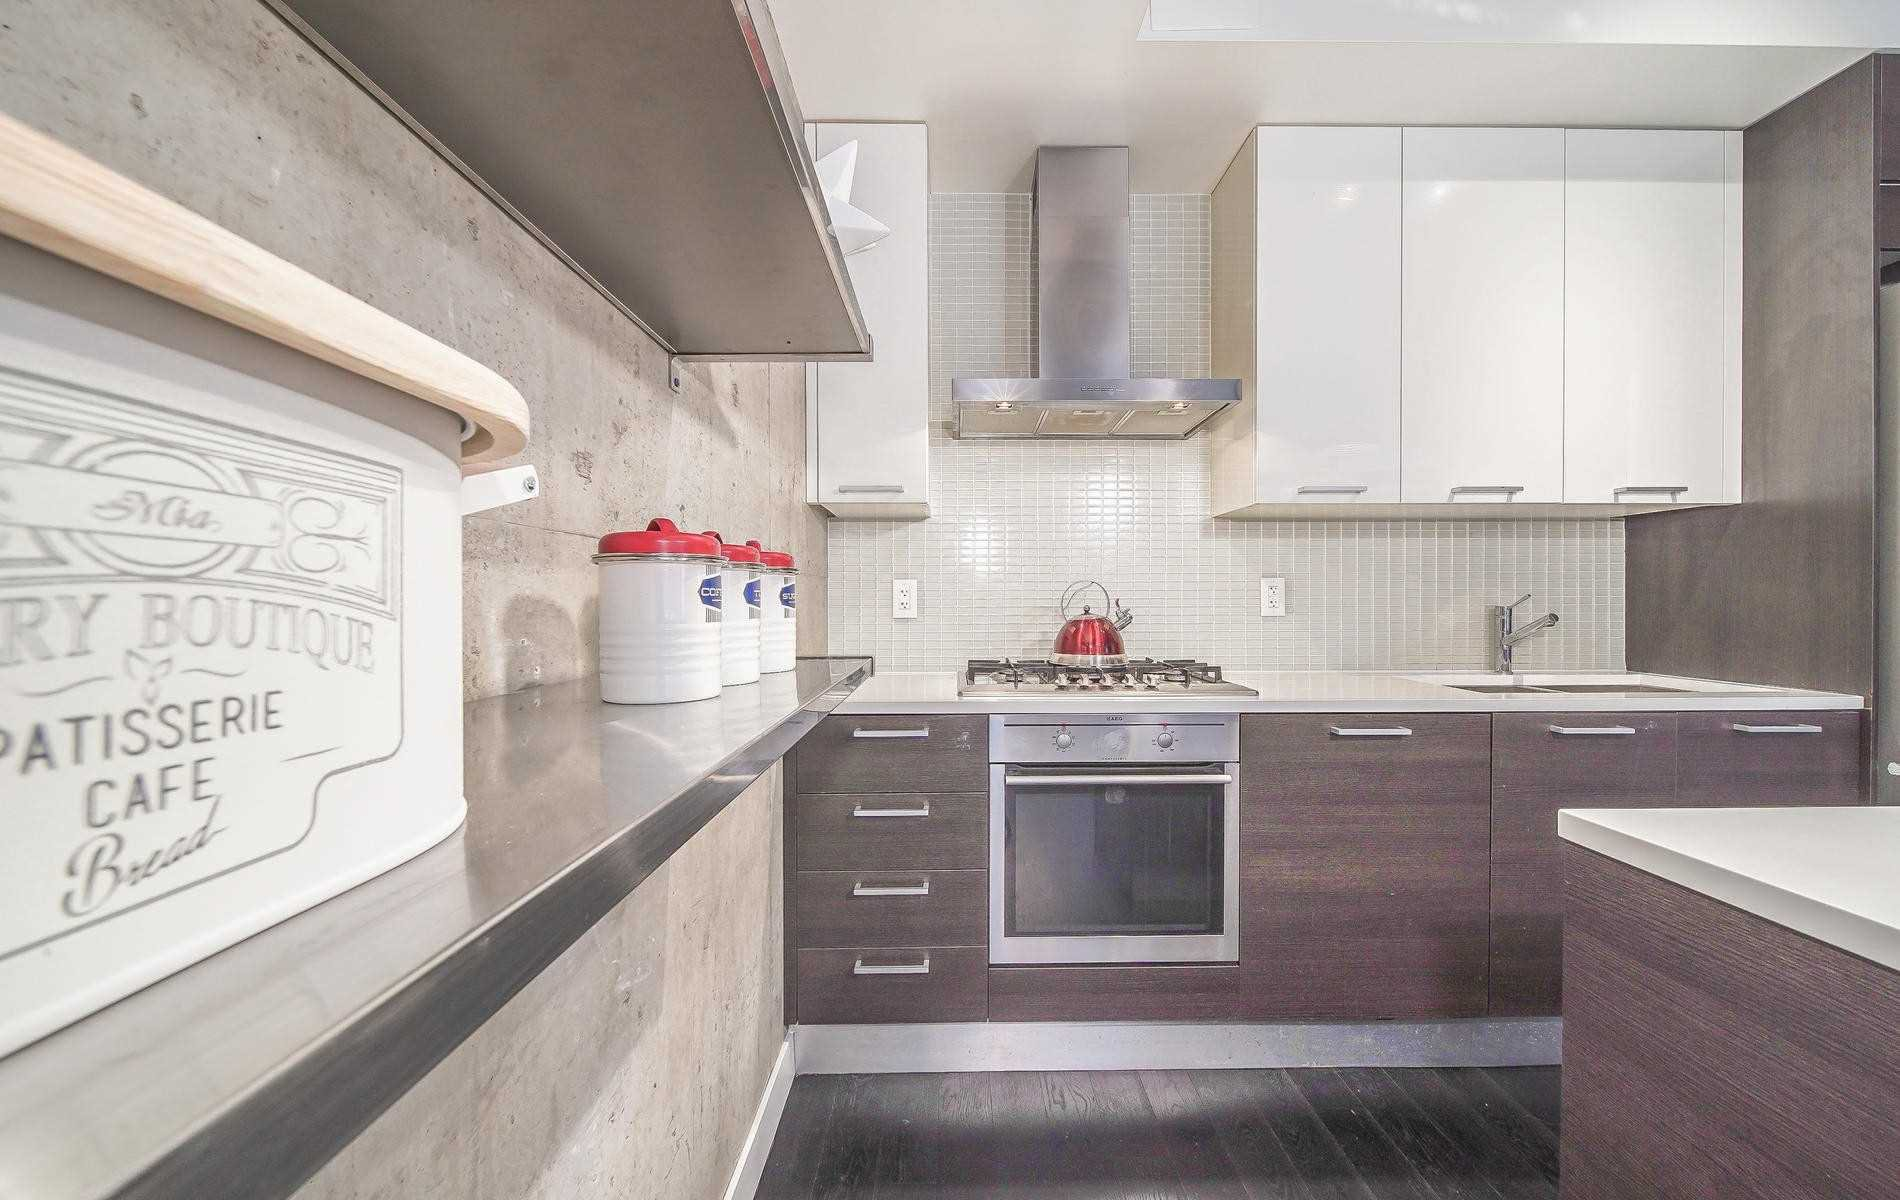 Photo 12: Photos: 408 90 Broadview Avenue in Toronto: South Riverdale Condo for sale (Toronto E01)  : MLS®# E4482454